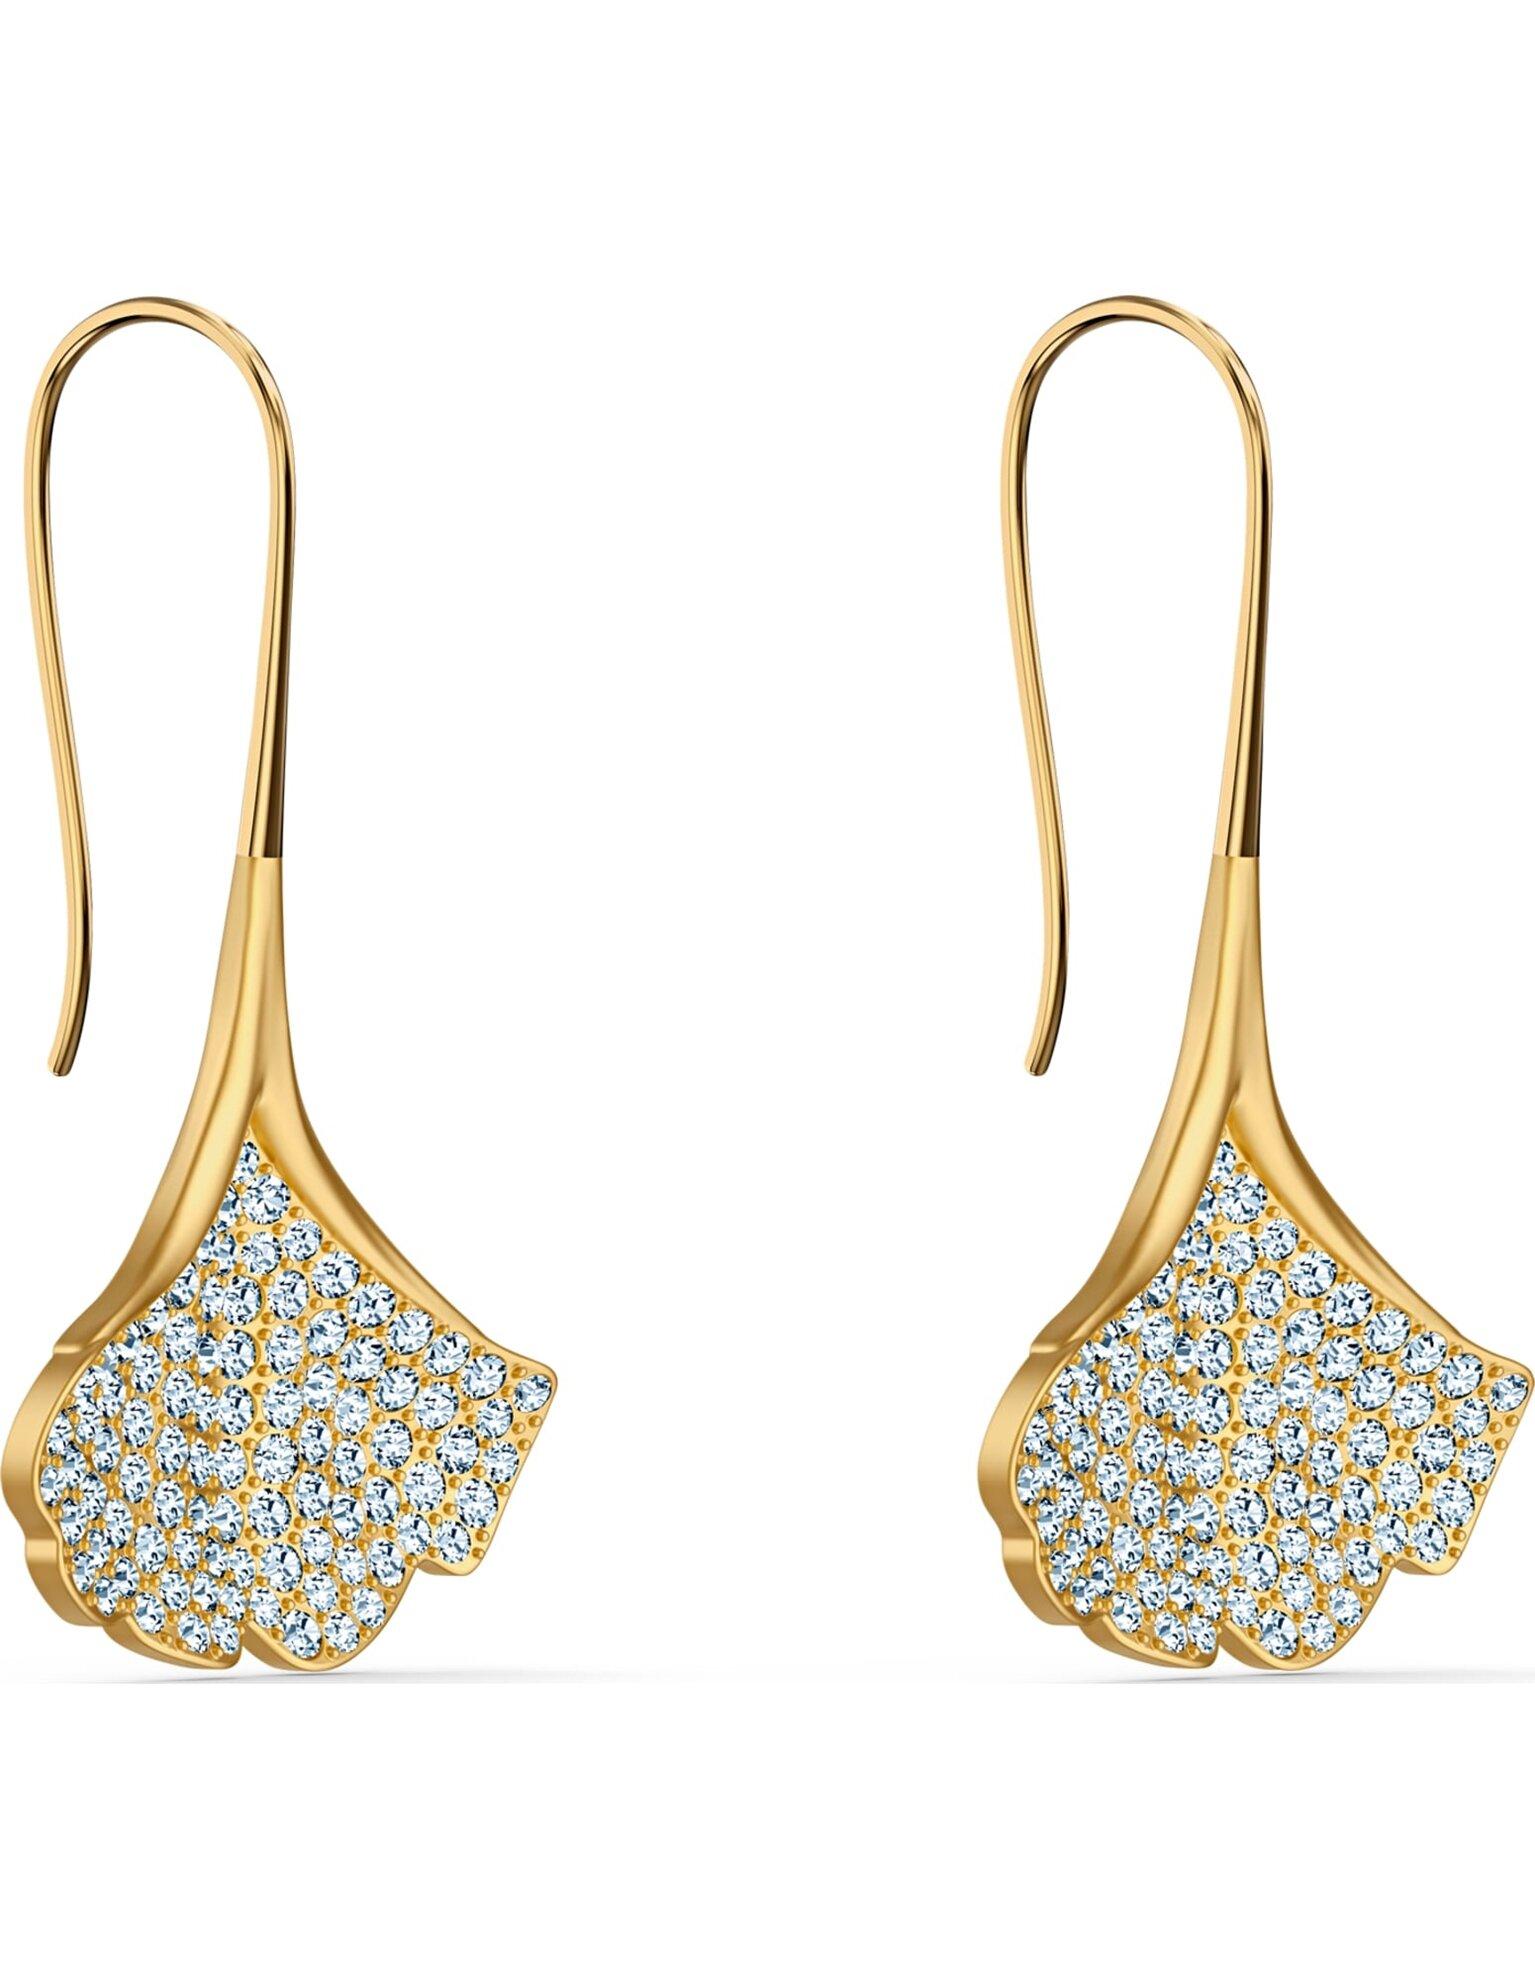 Picture of Stunning Ginko İğneli Küpeler, Beyaz, Altın rengi kaplama